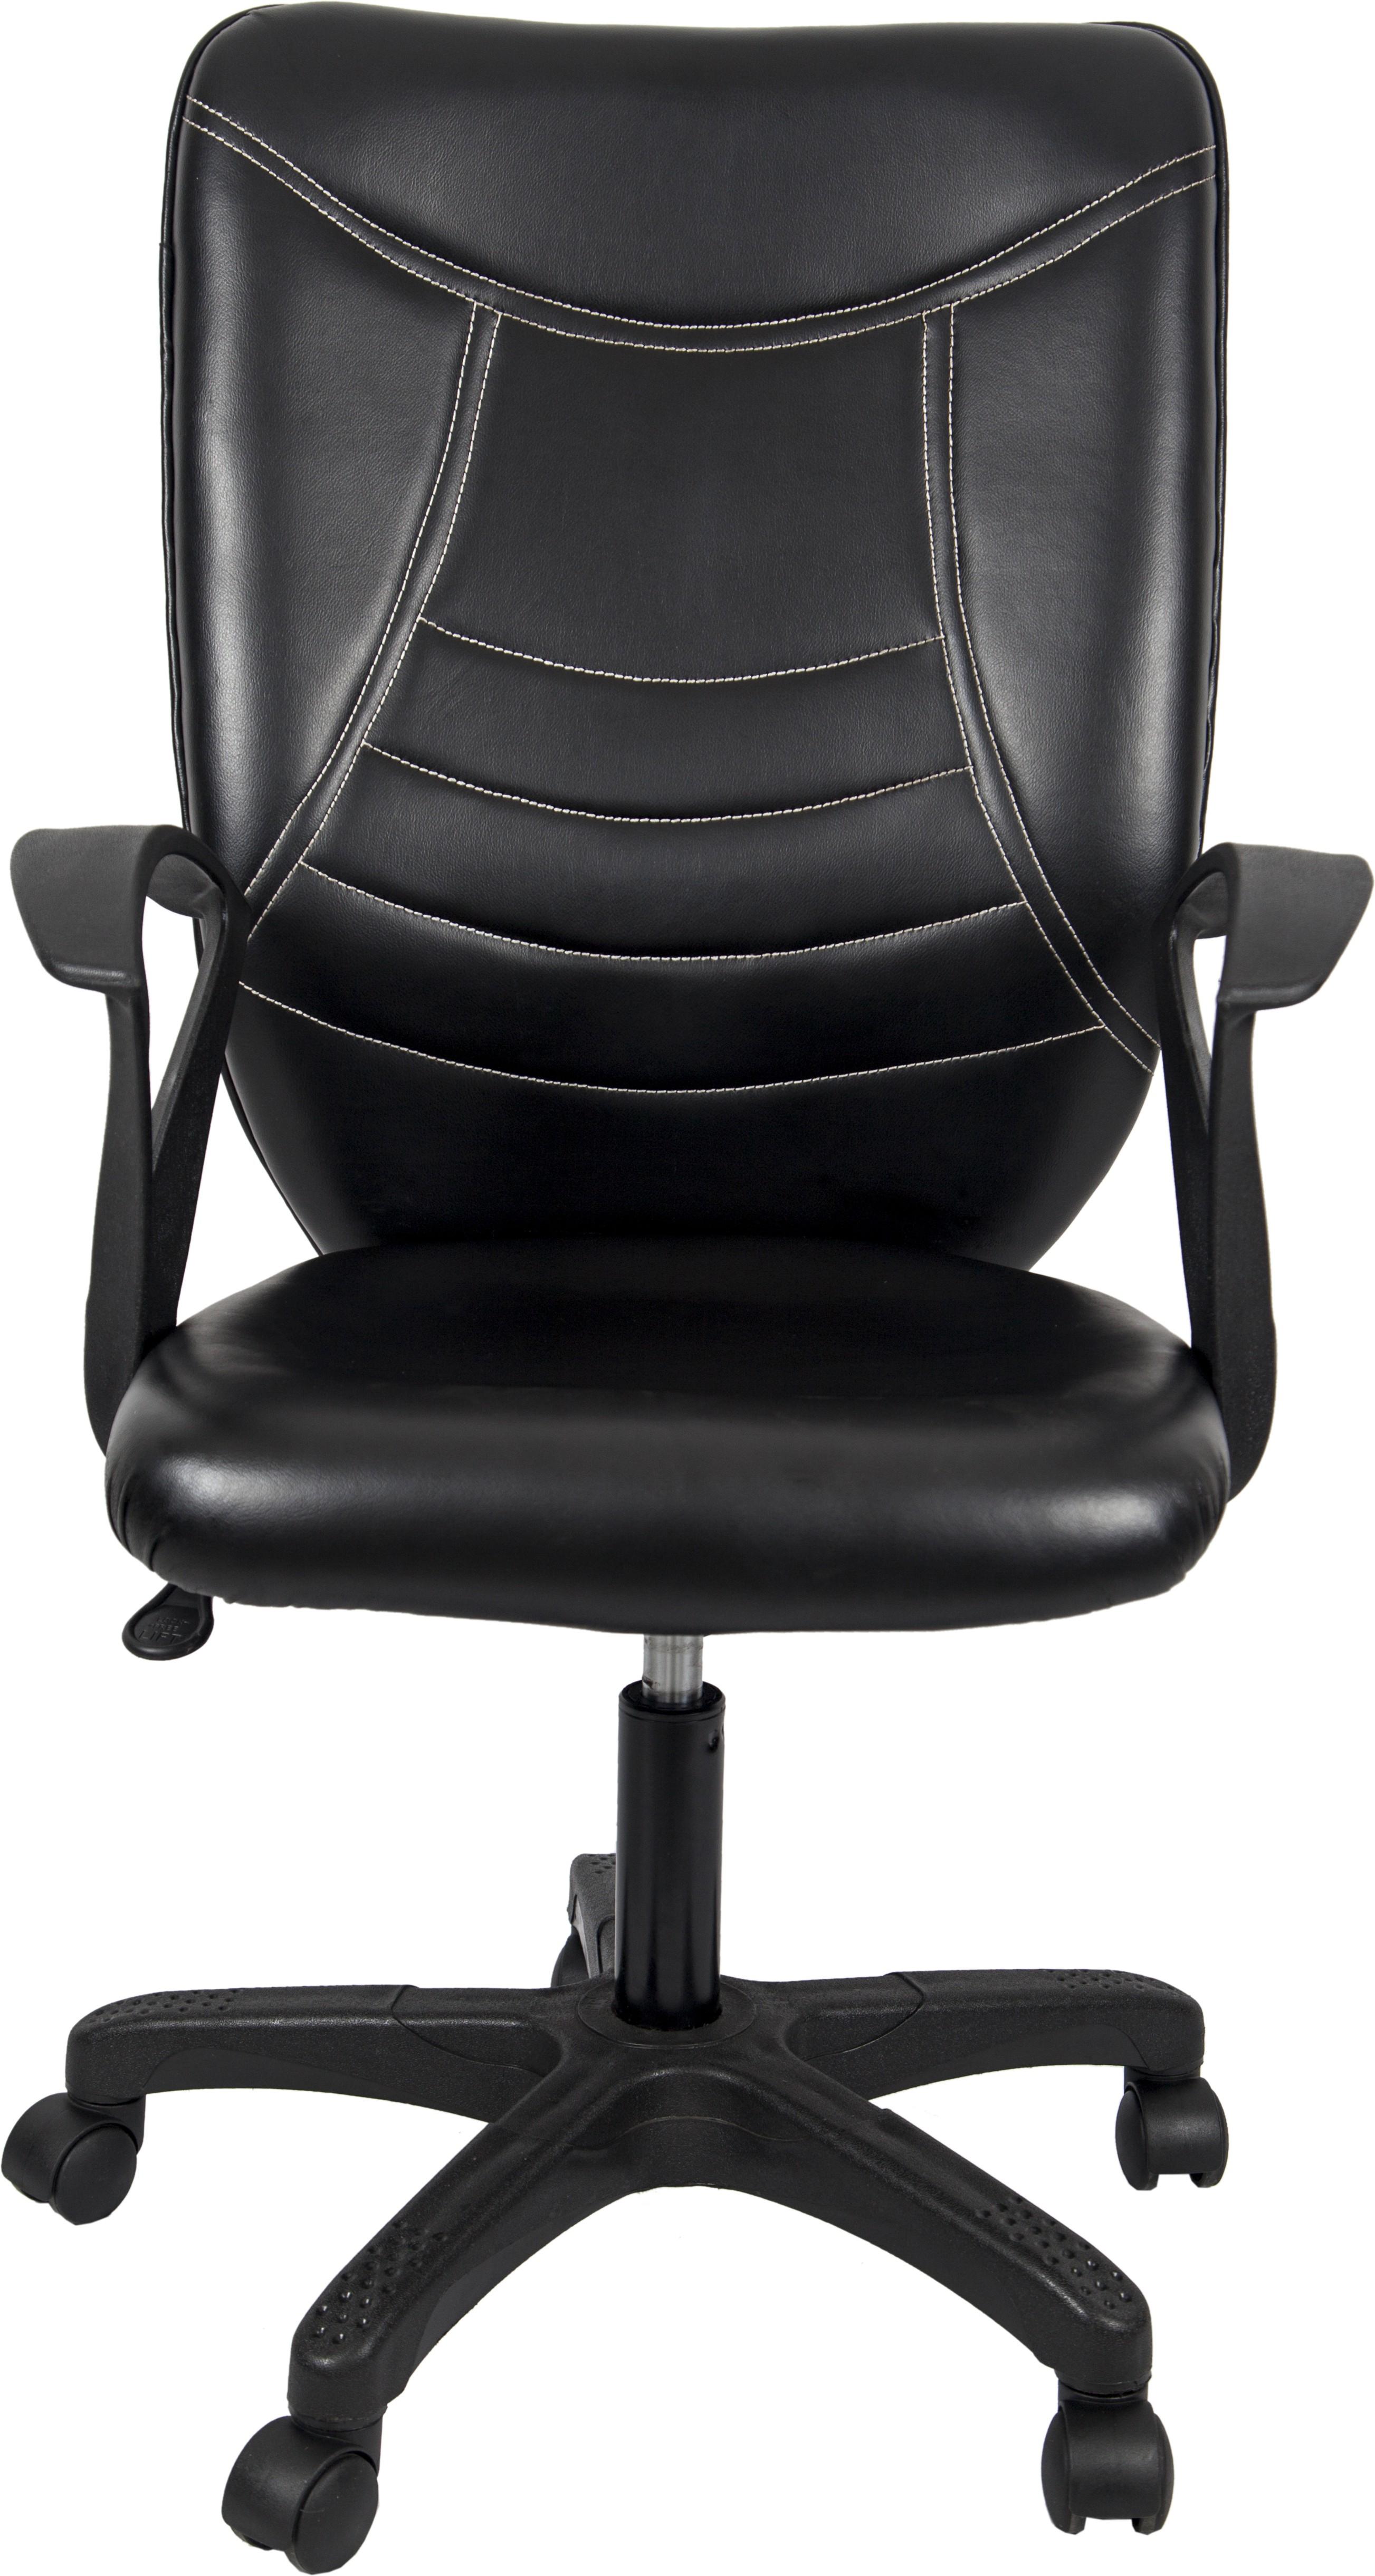 View Hetal Enterprises Leatherette Office Chair(Black) Furniture (Hetal Enterprises)